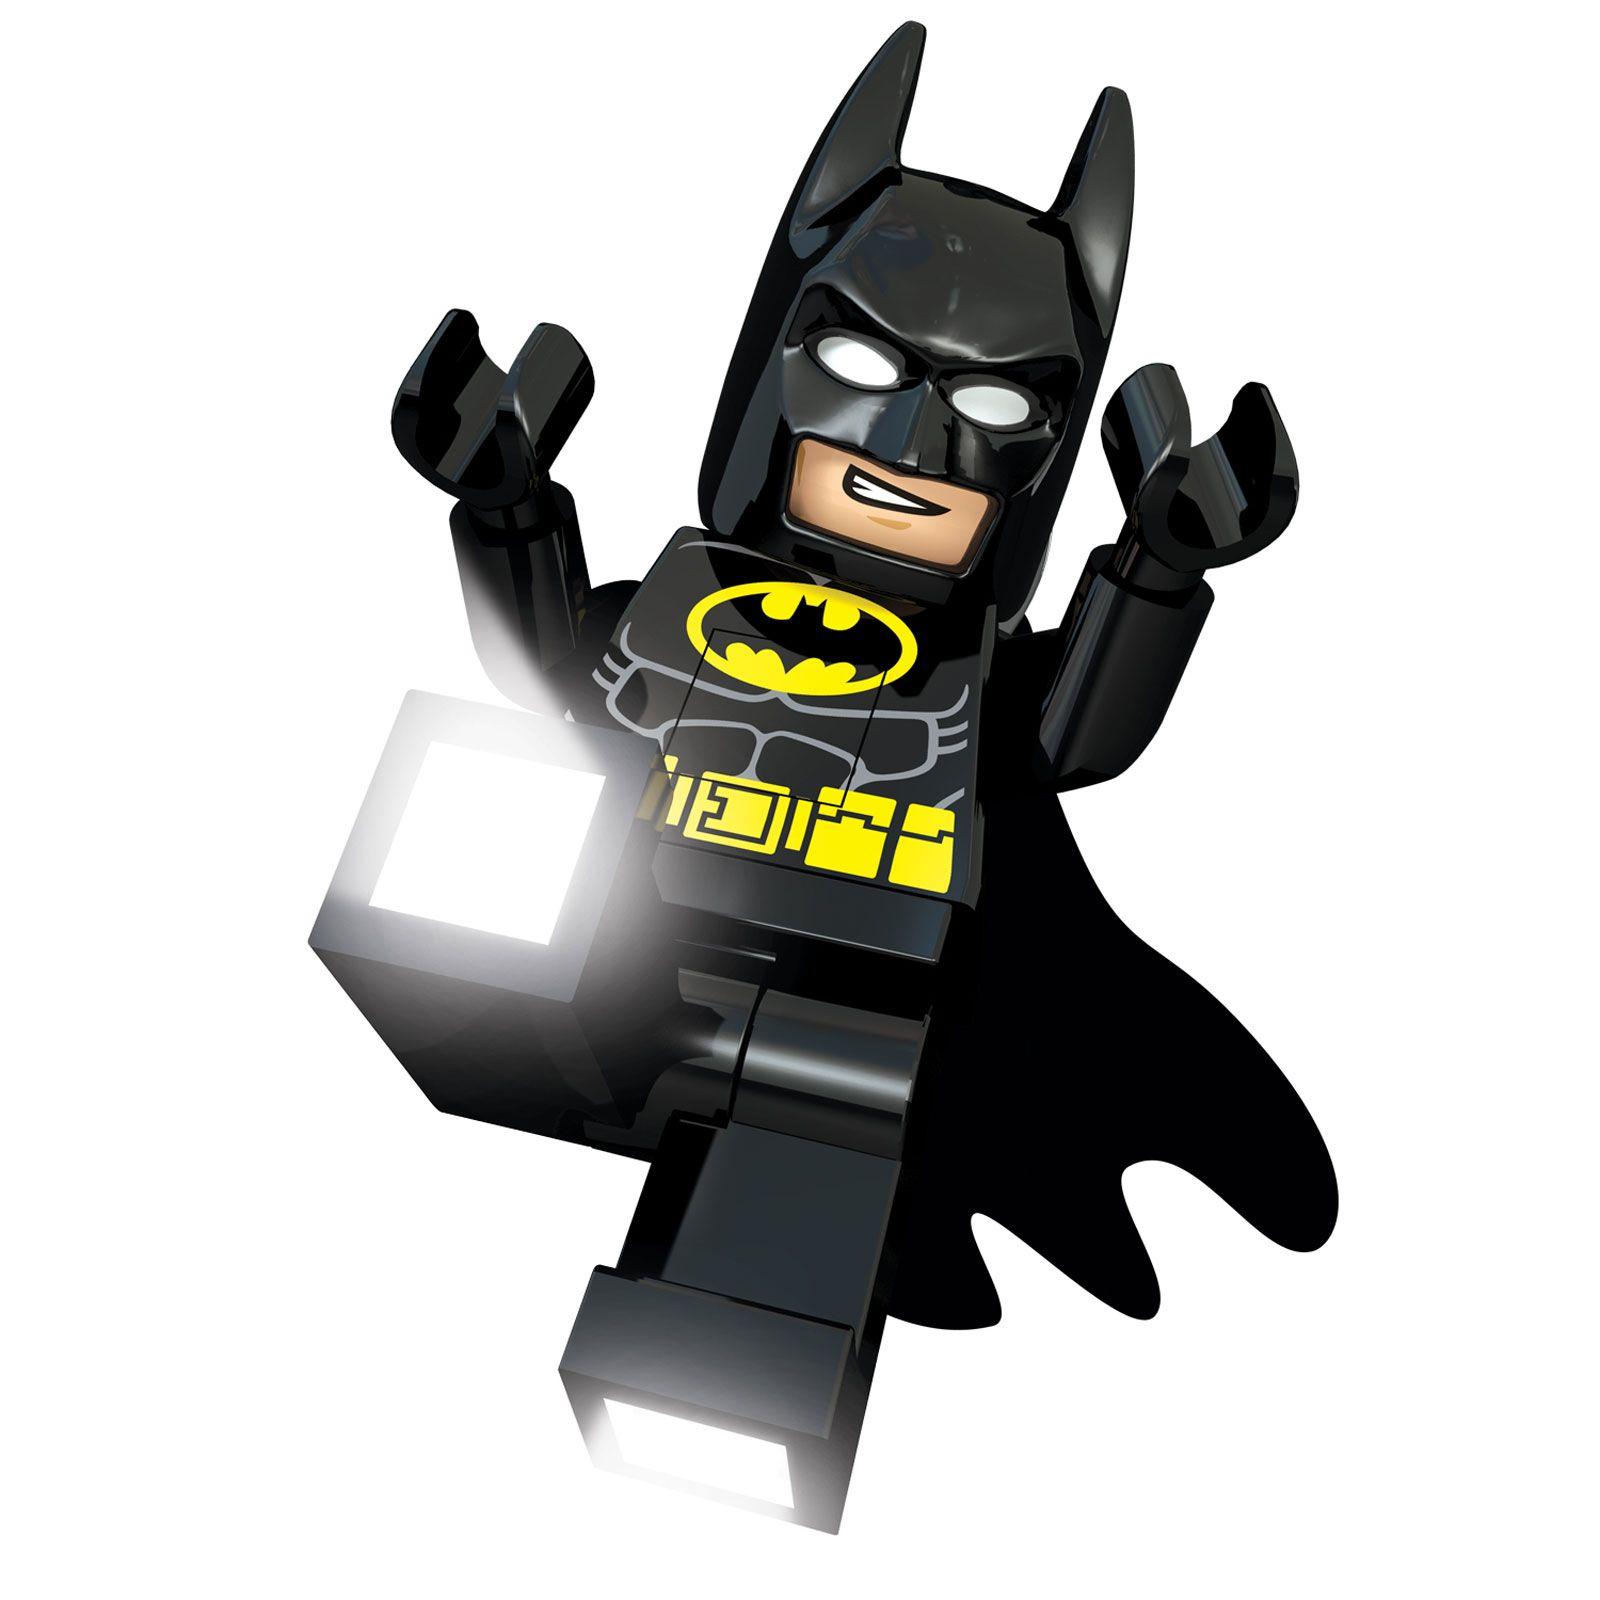 lego dc superhelden batman led taschenlampe bettseitig licht kinder ebay. Black Bedroom Furniture Sets. Home Design Ideas